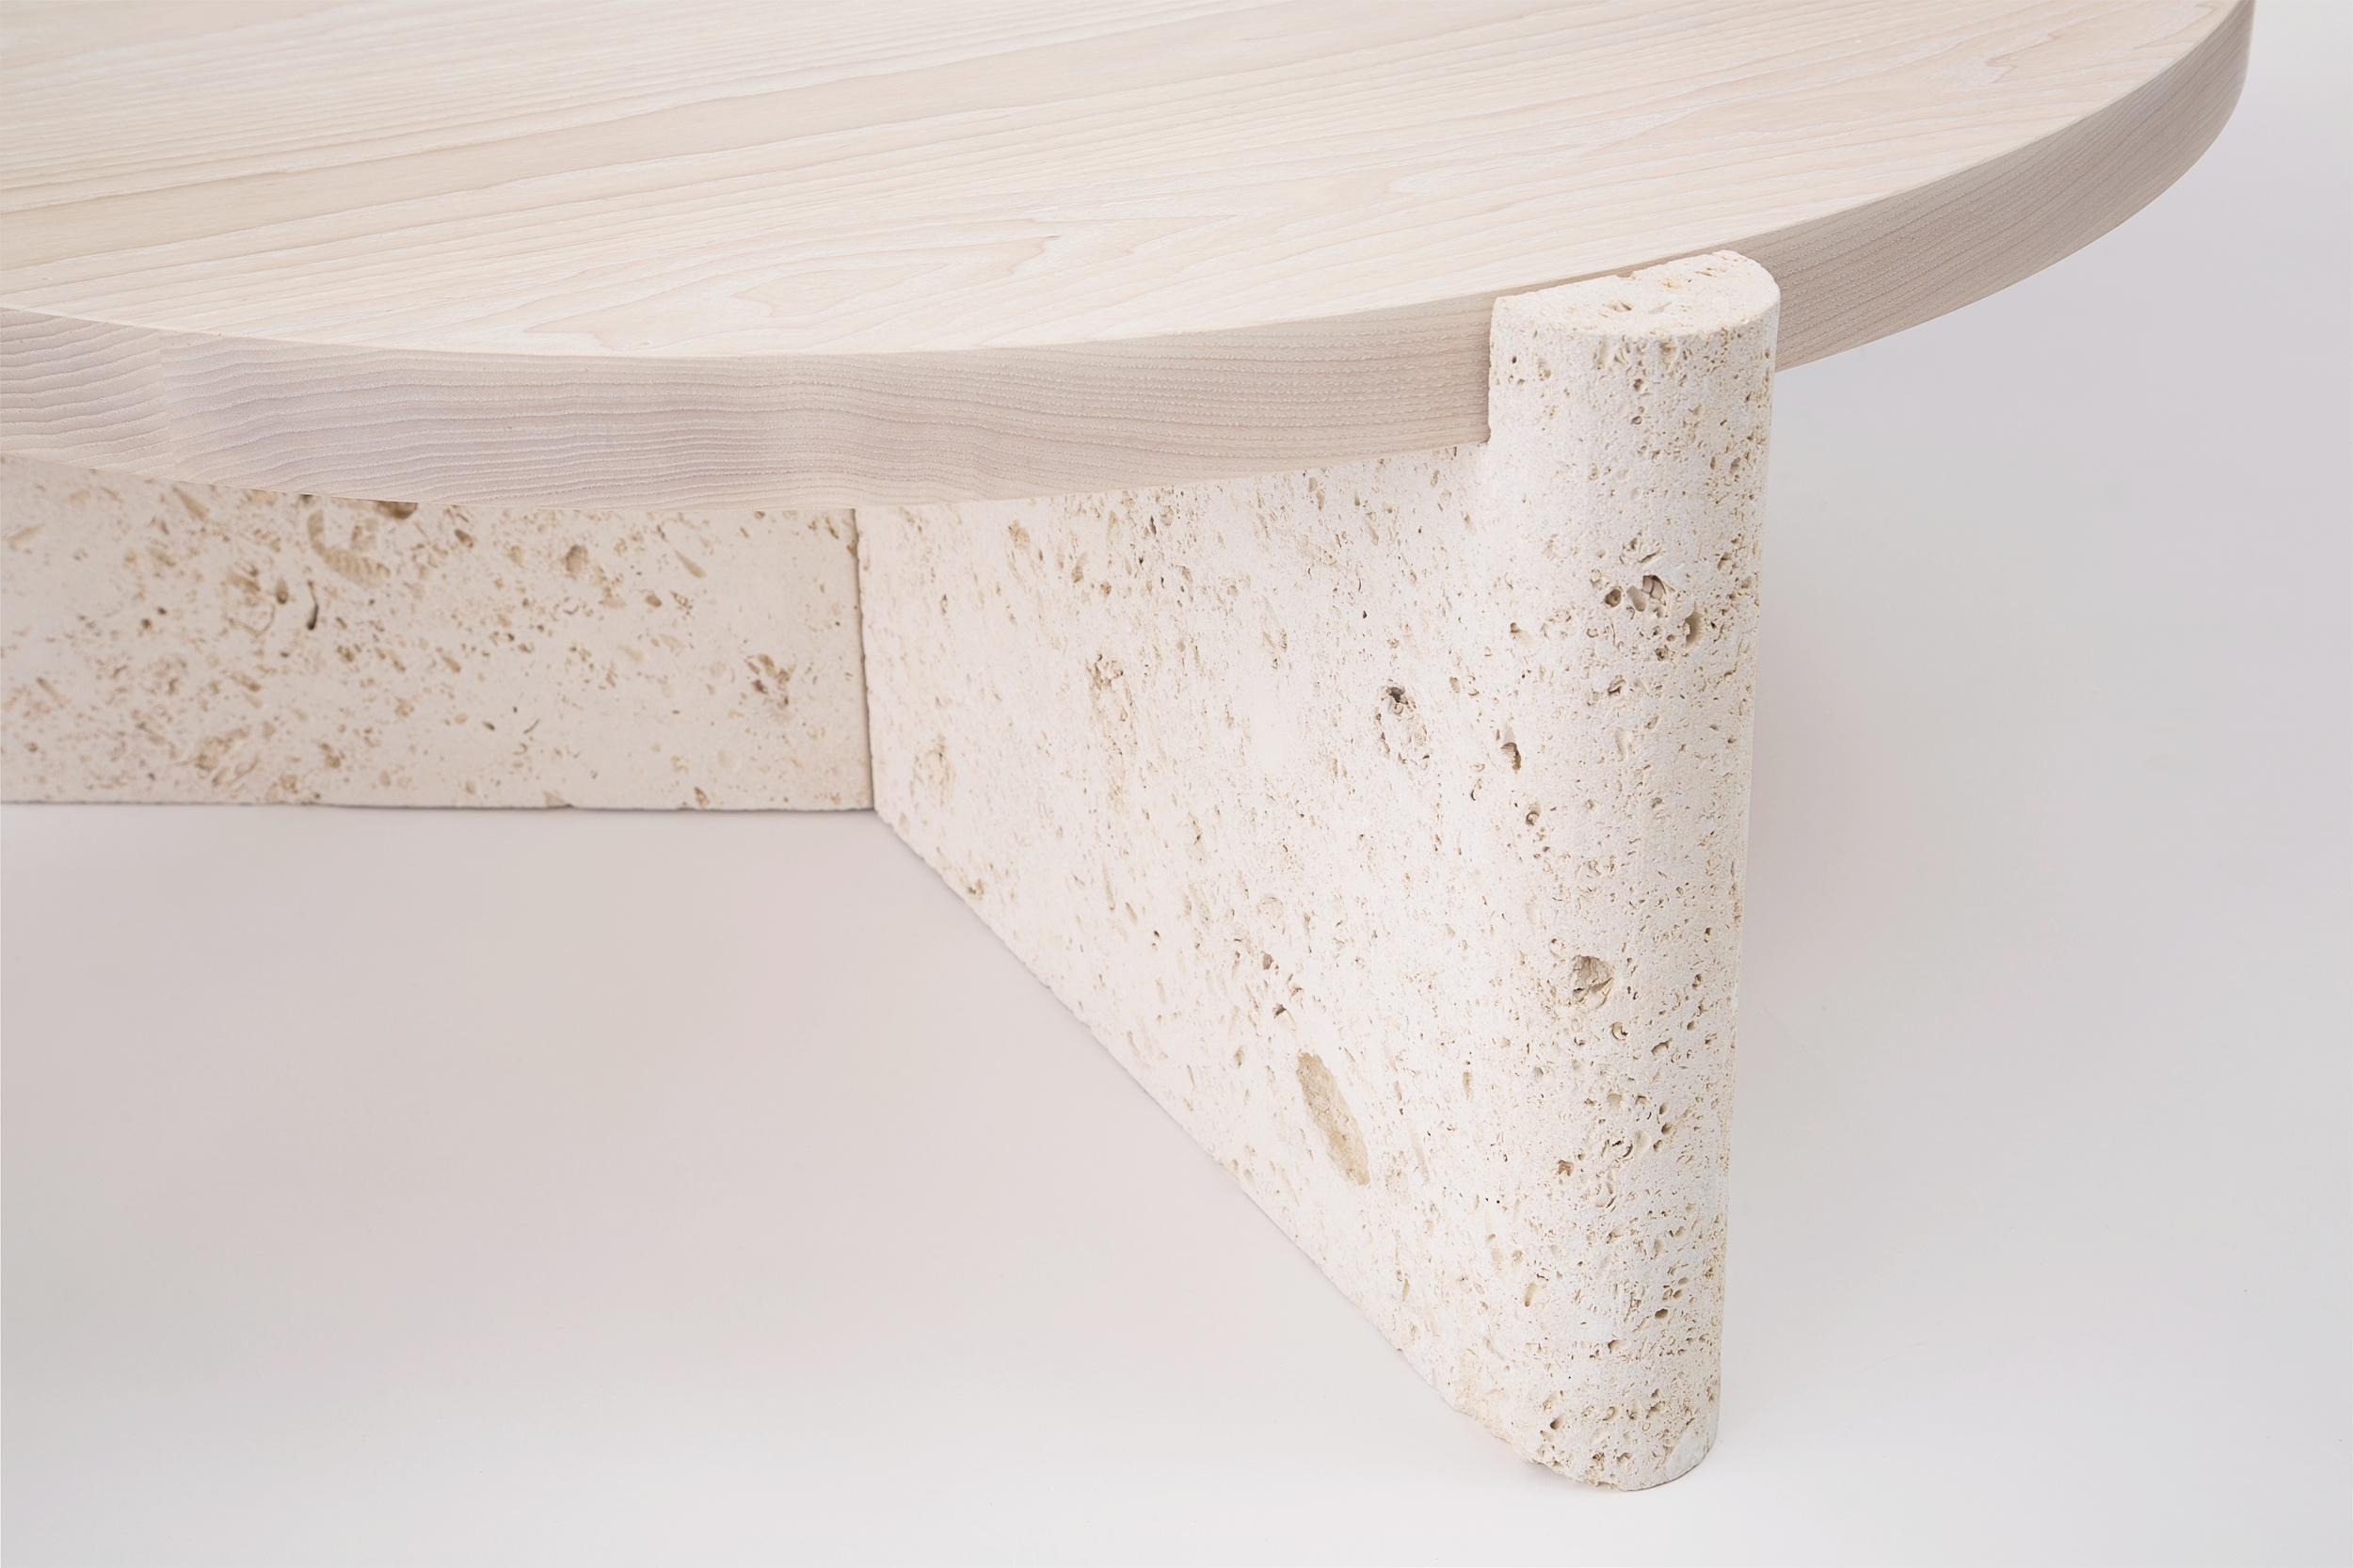 YUCCASTUFF_CONCHO TABLE_VIEW 003.jpg